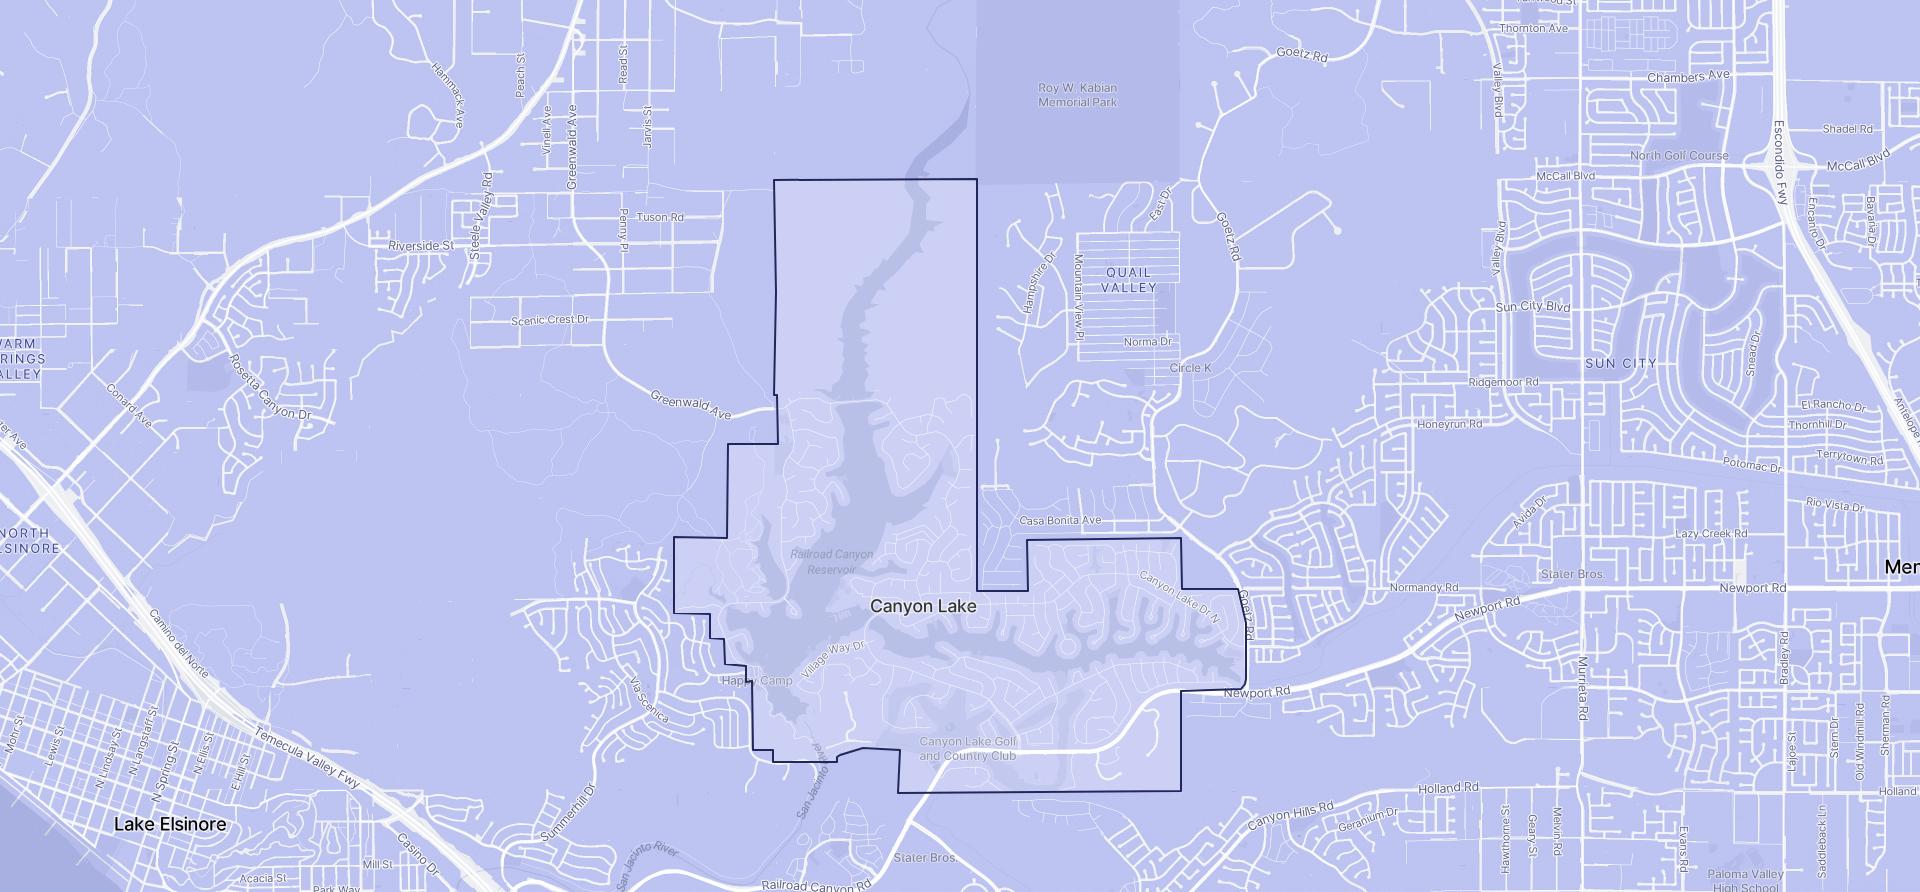 Image of Canyon Lake boundaries on a map.